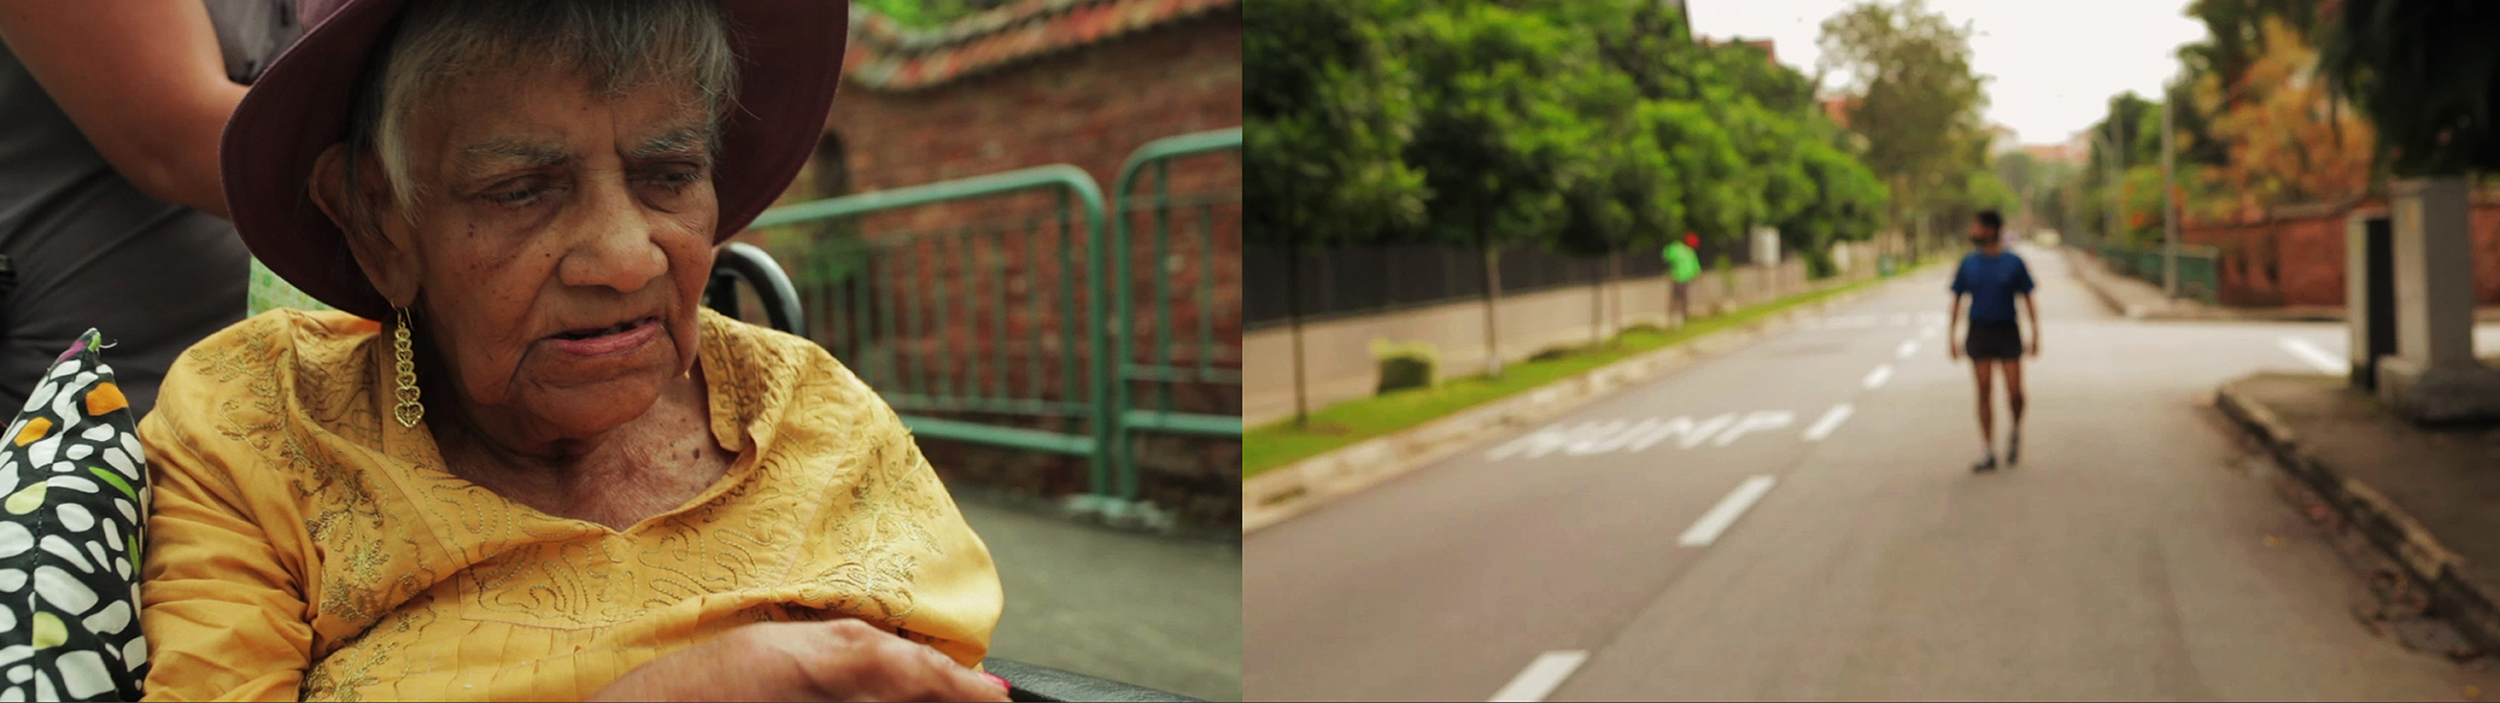 Goddess+of+Mercy+Film+Stills+2.jpg